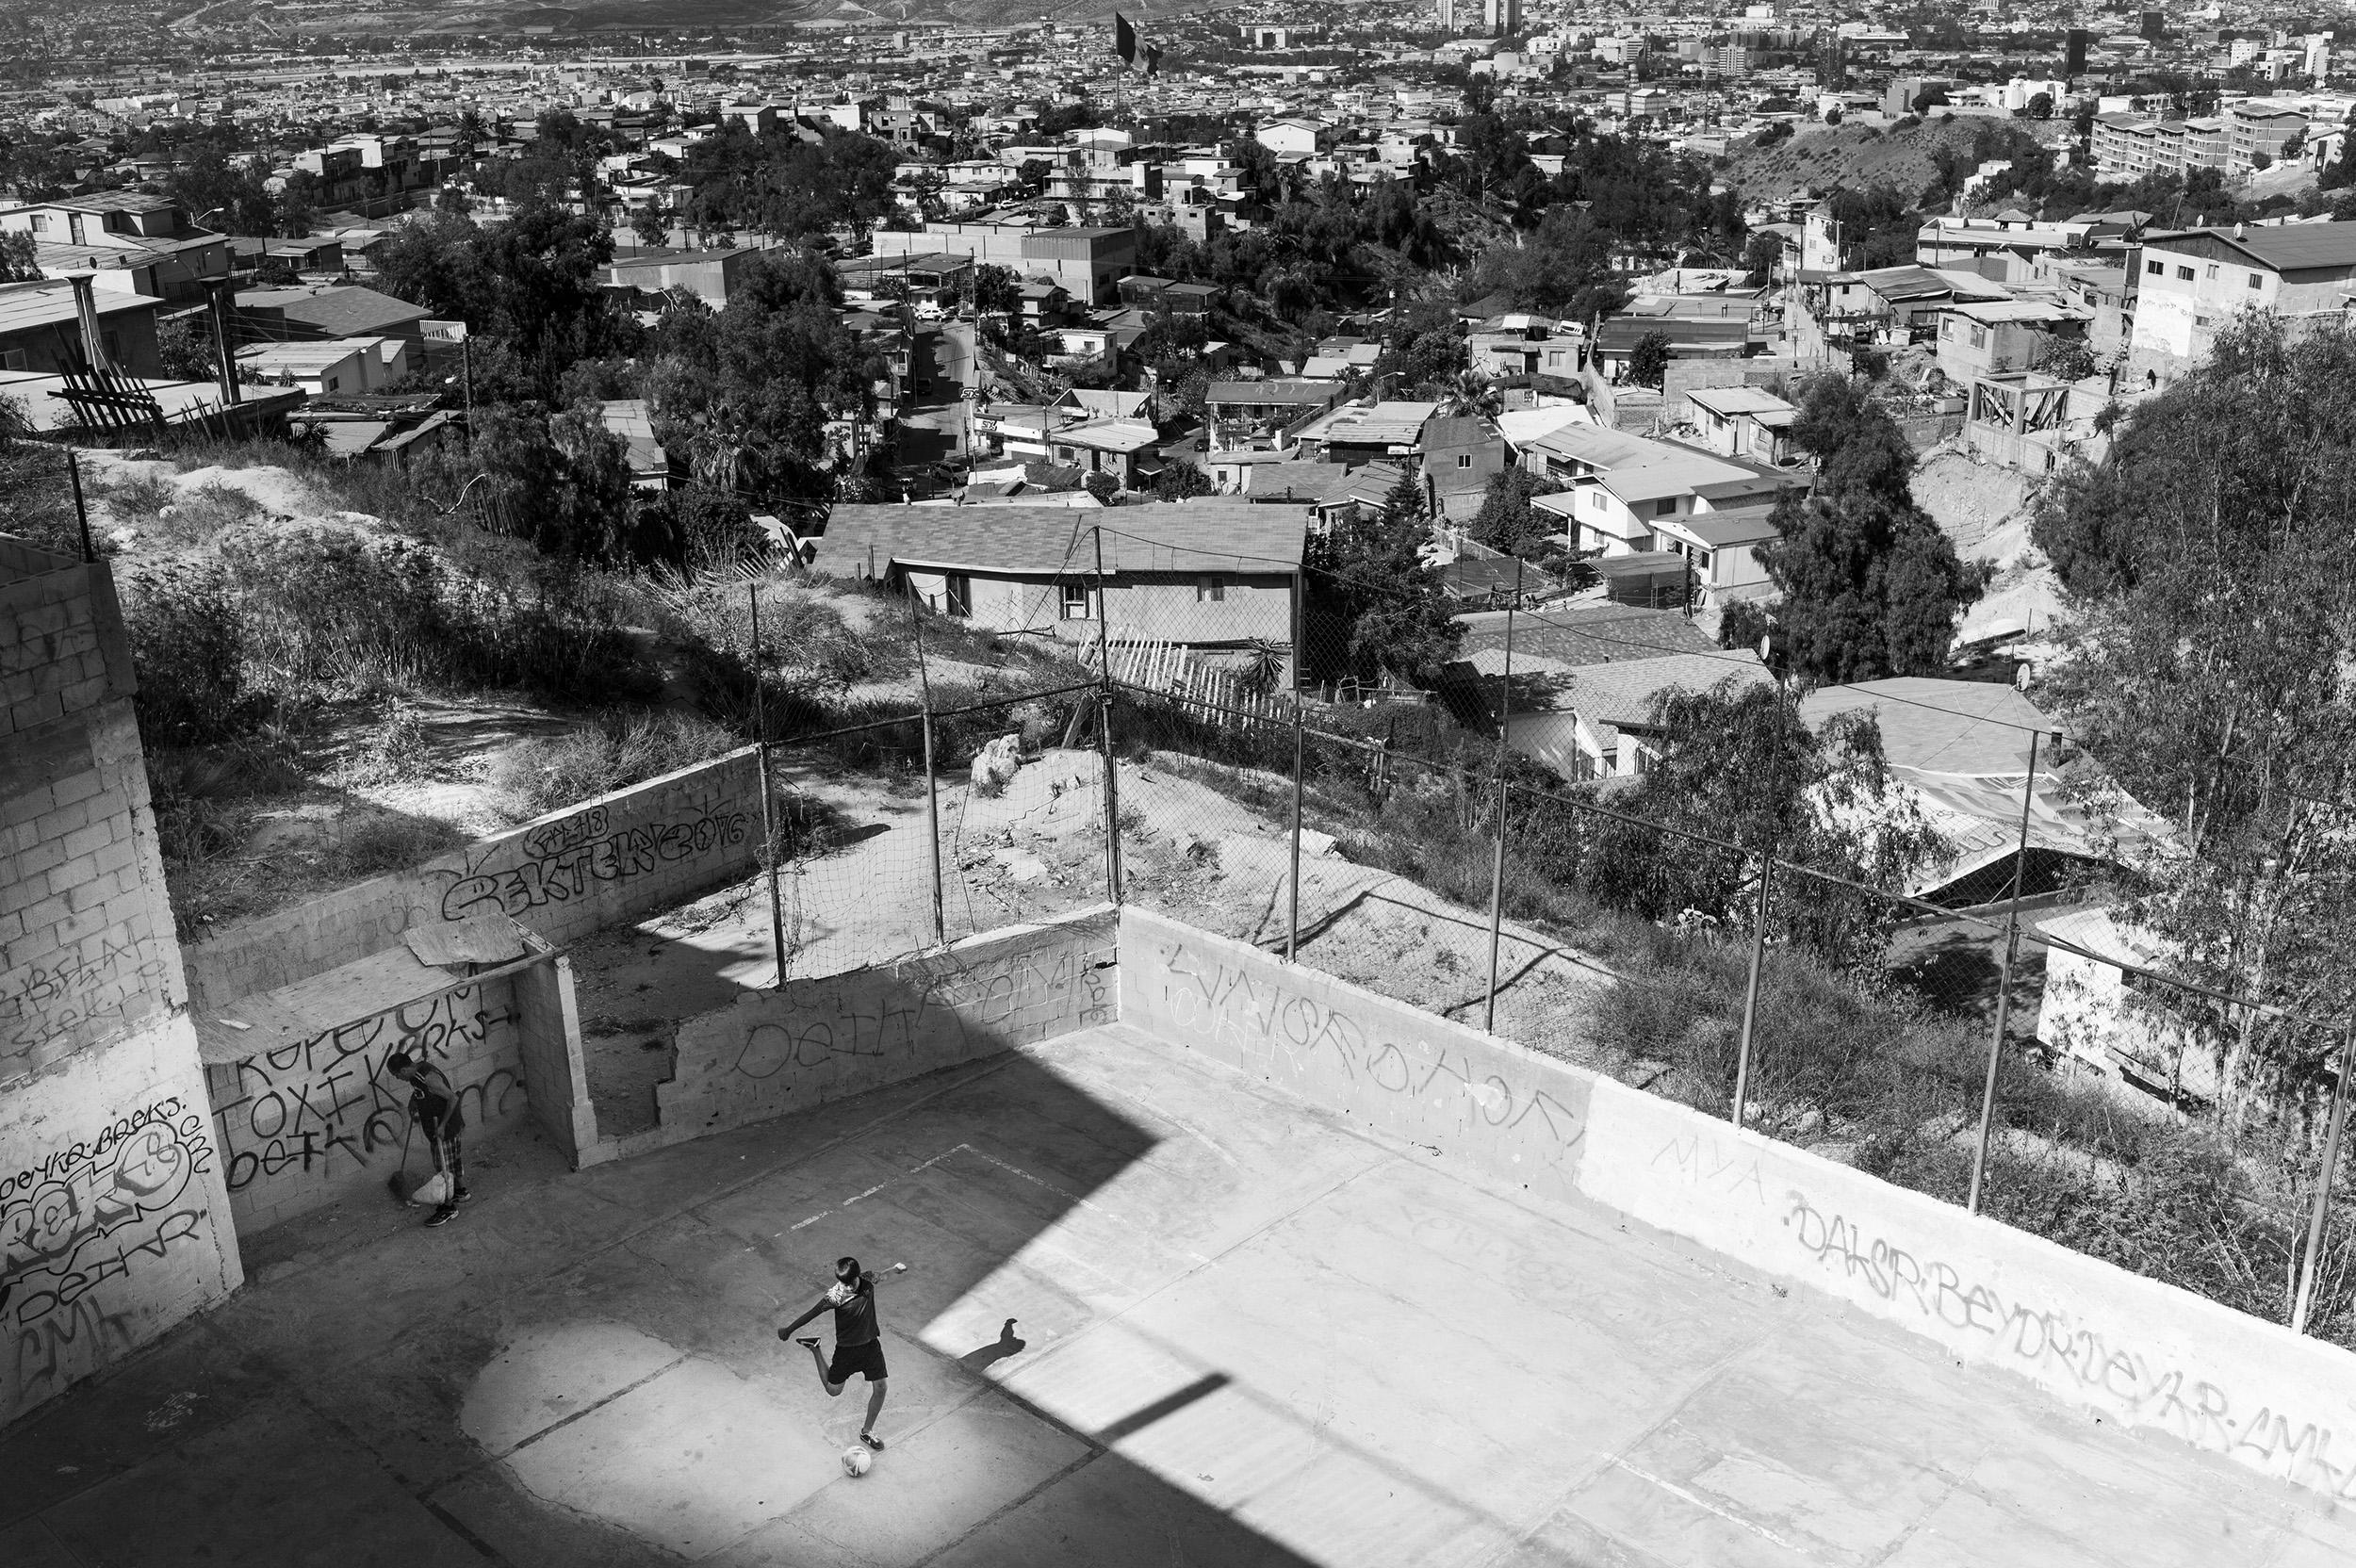 Tijuana, Mexico, 2016